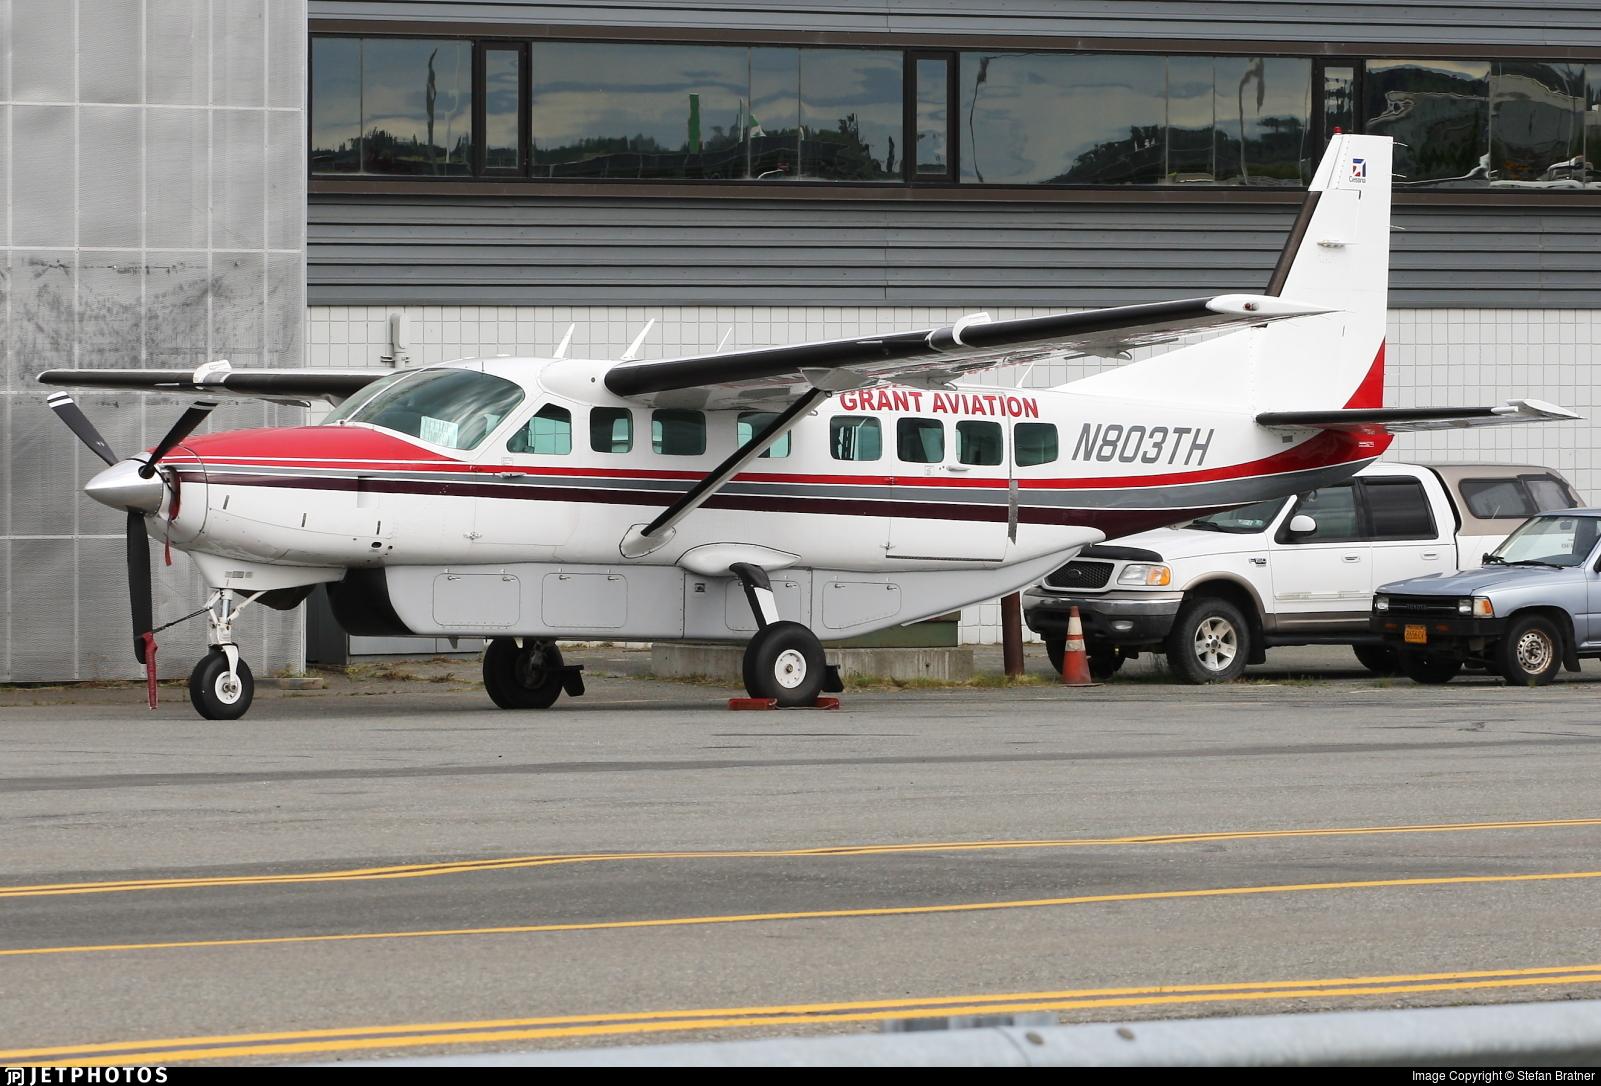 N803TH - Cessna 208B Super Cargomaster - Grant Aviation